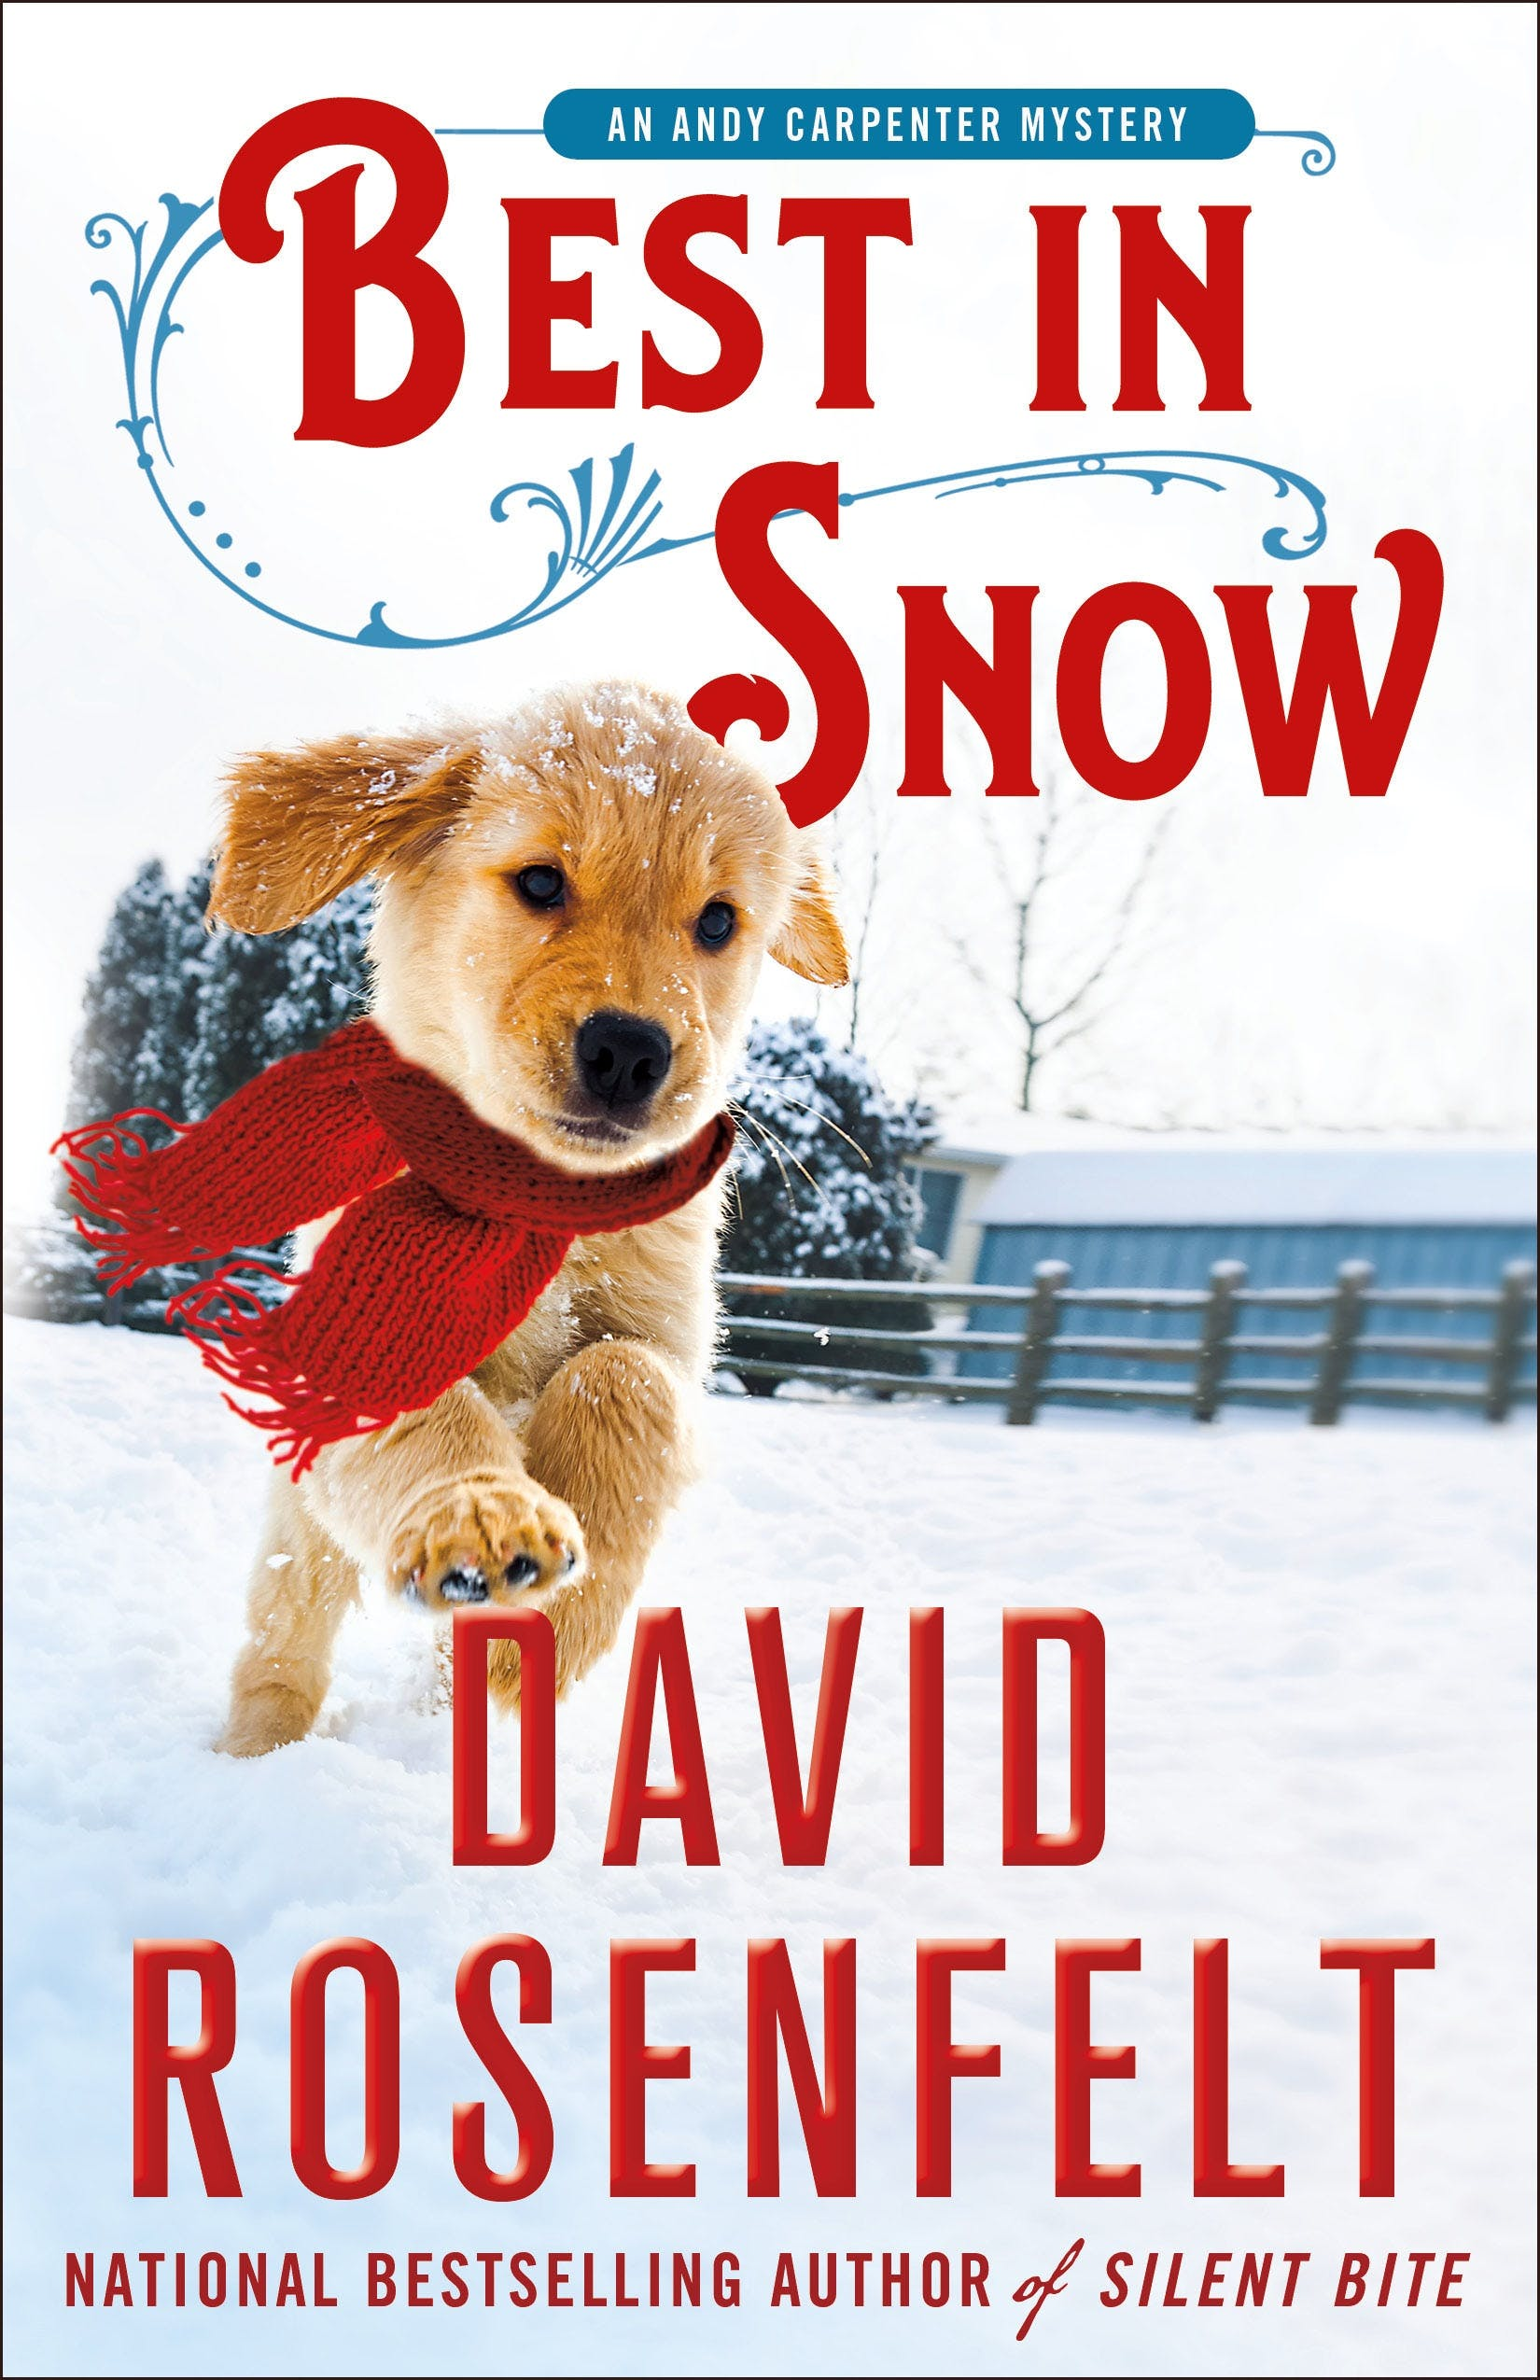 Image of Best in Snow